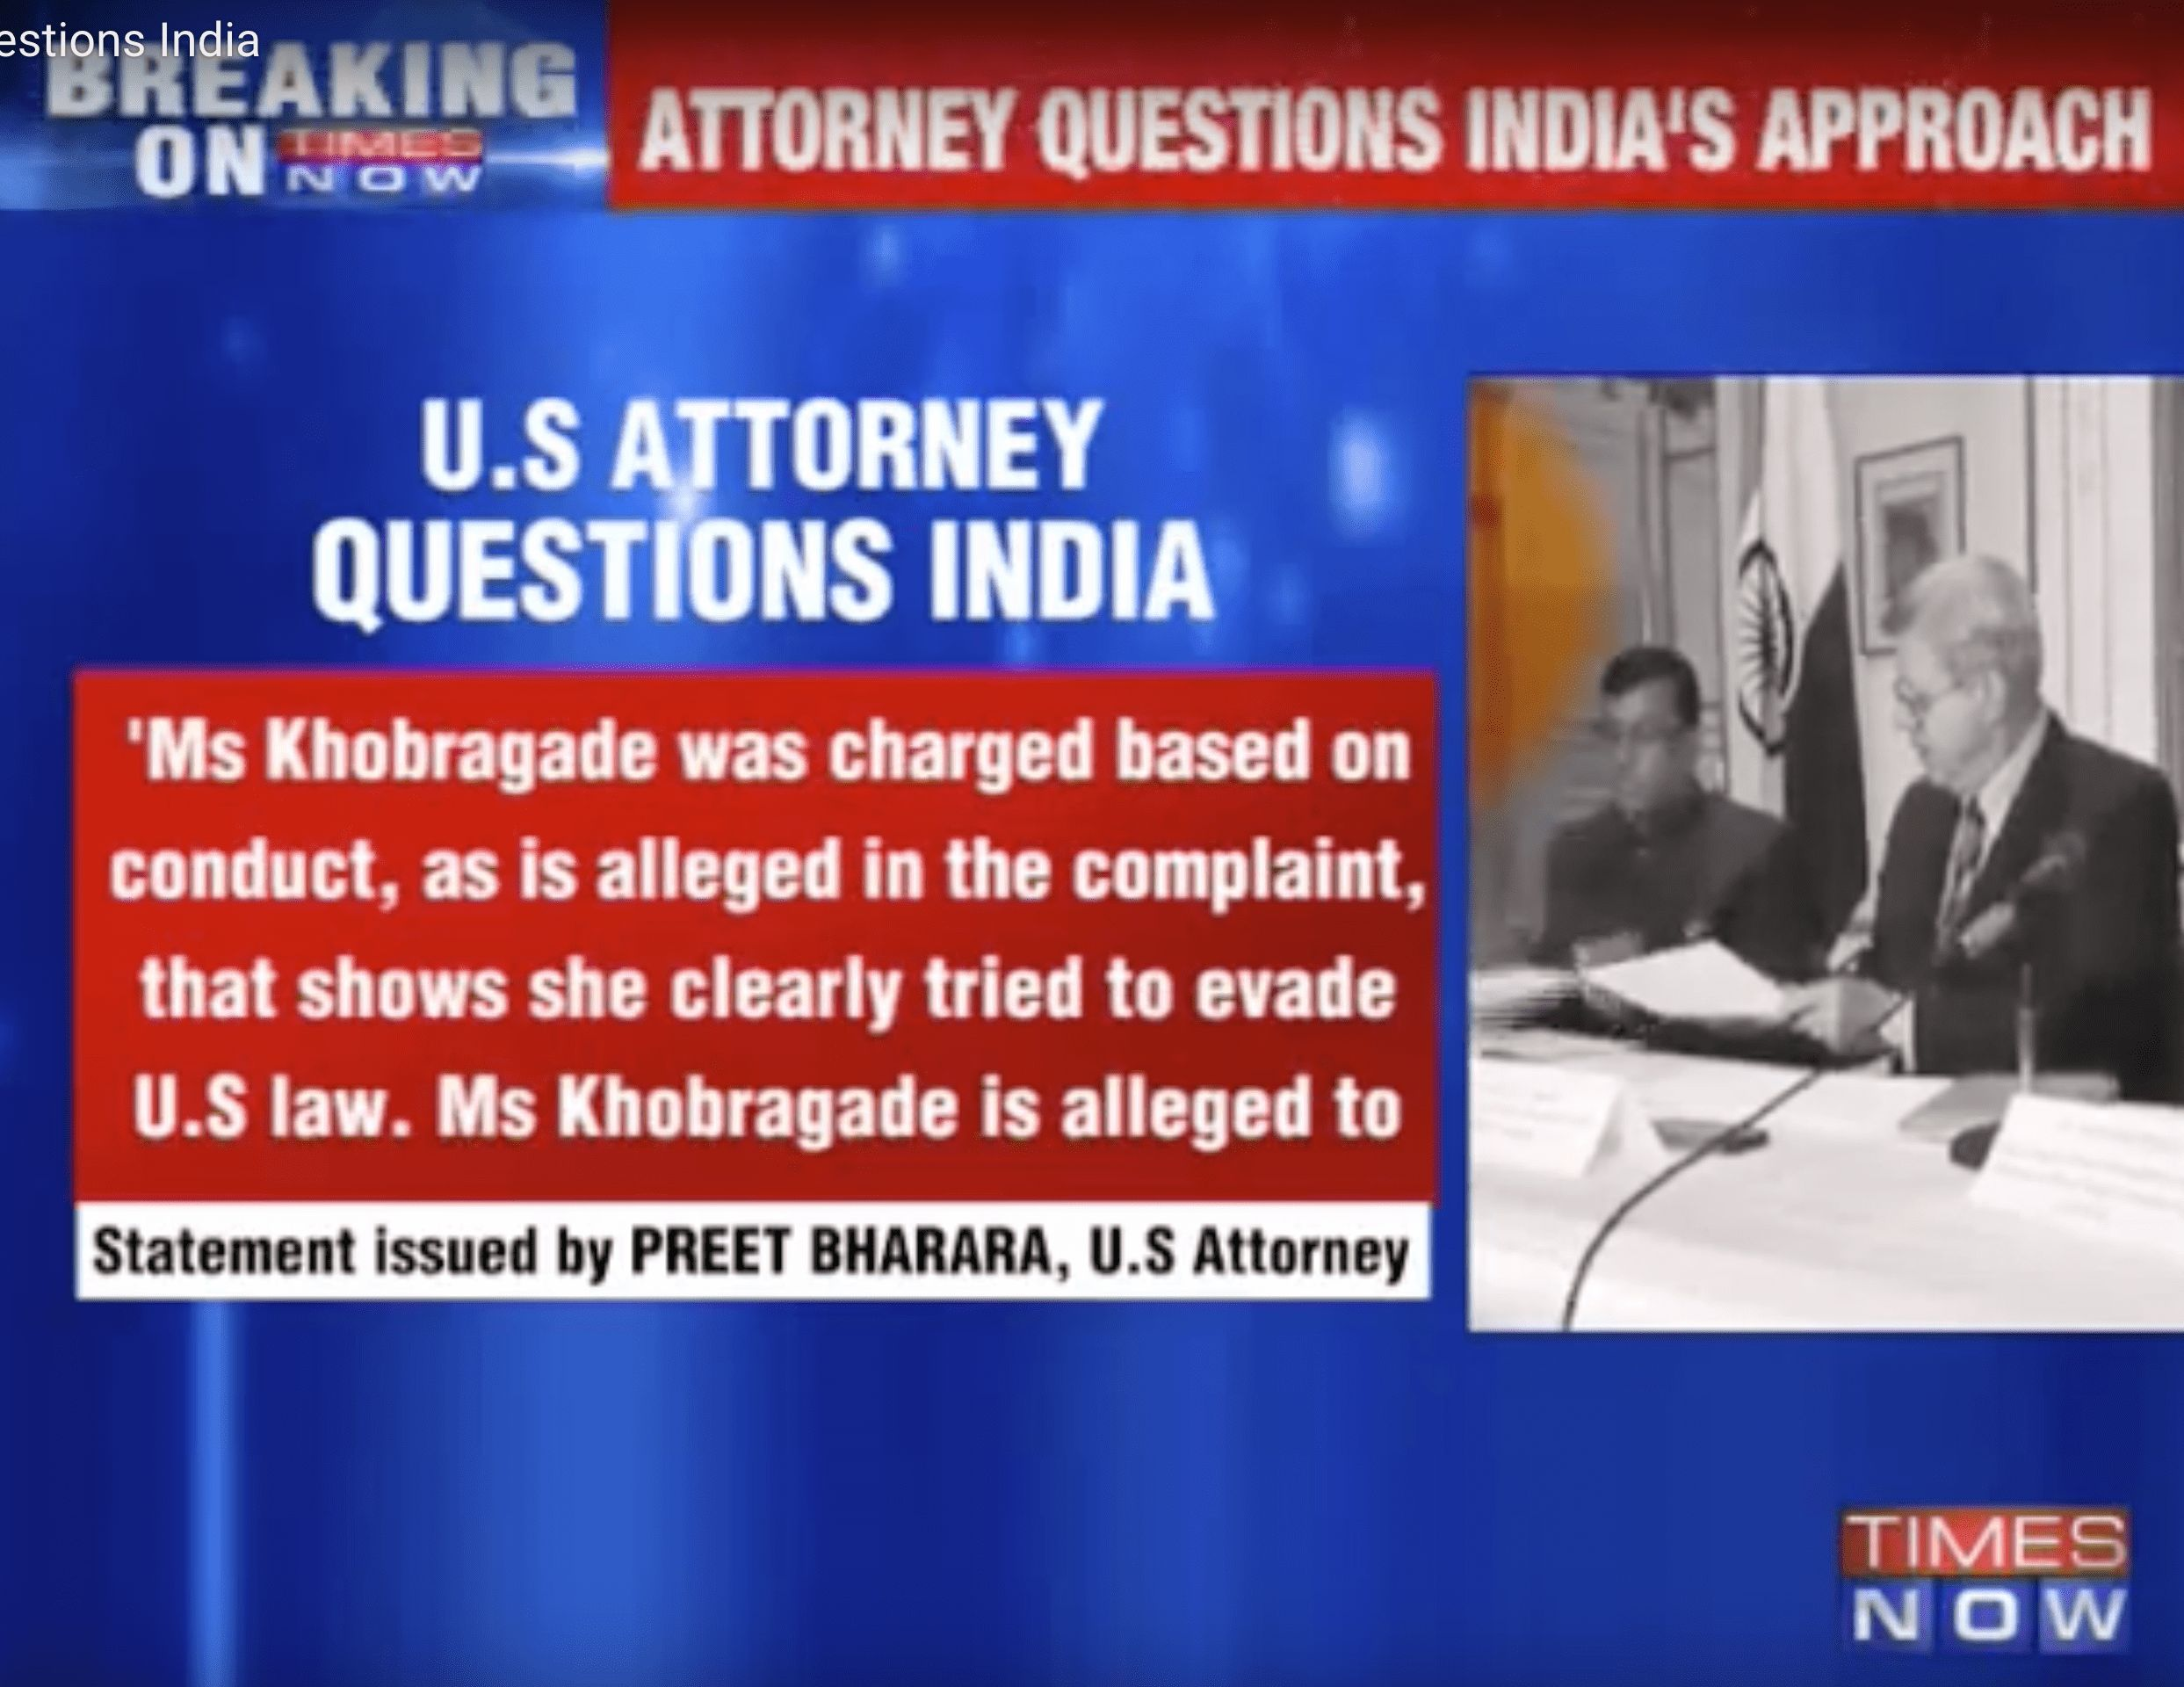 How The Devyani Khobragade Case Led To TV Anchors Calling Preet Bharara A 'Self-Loathing